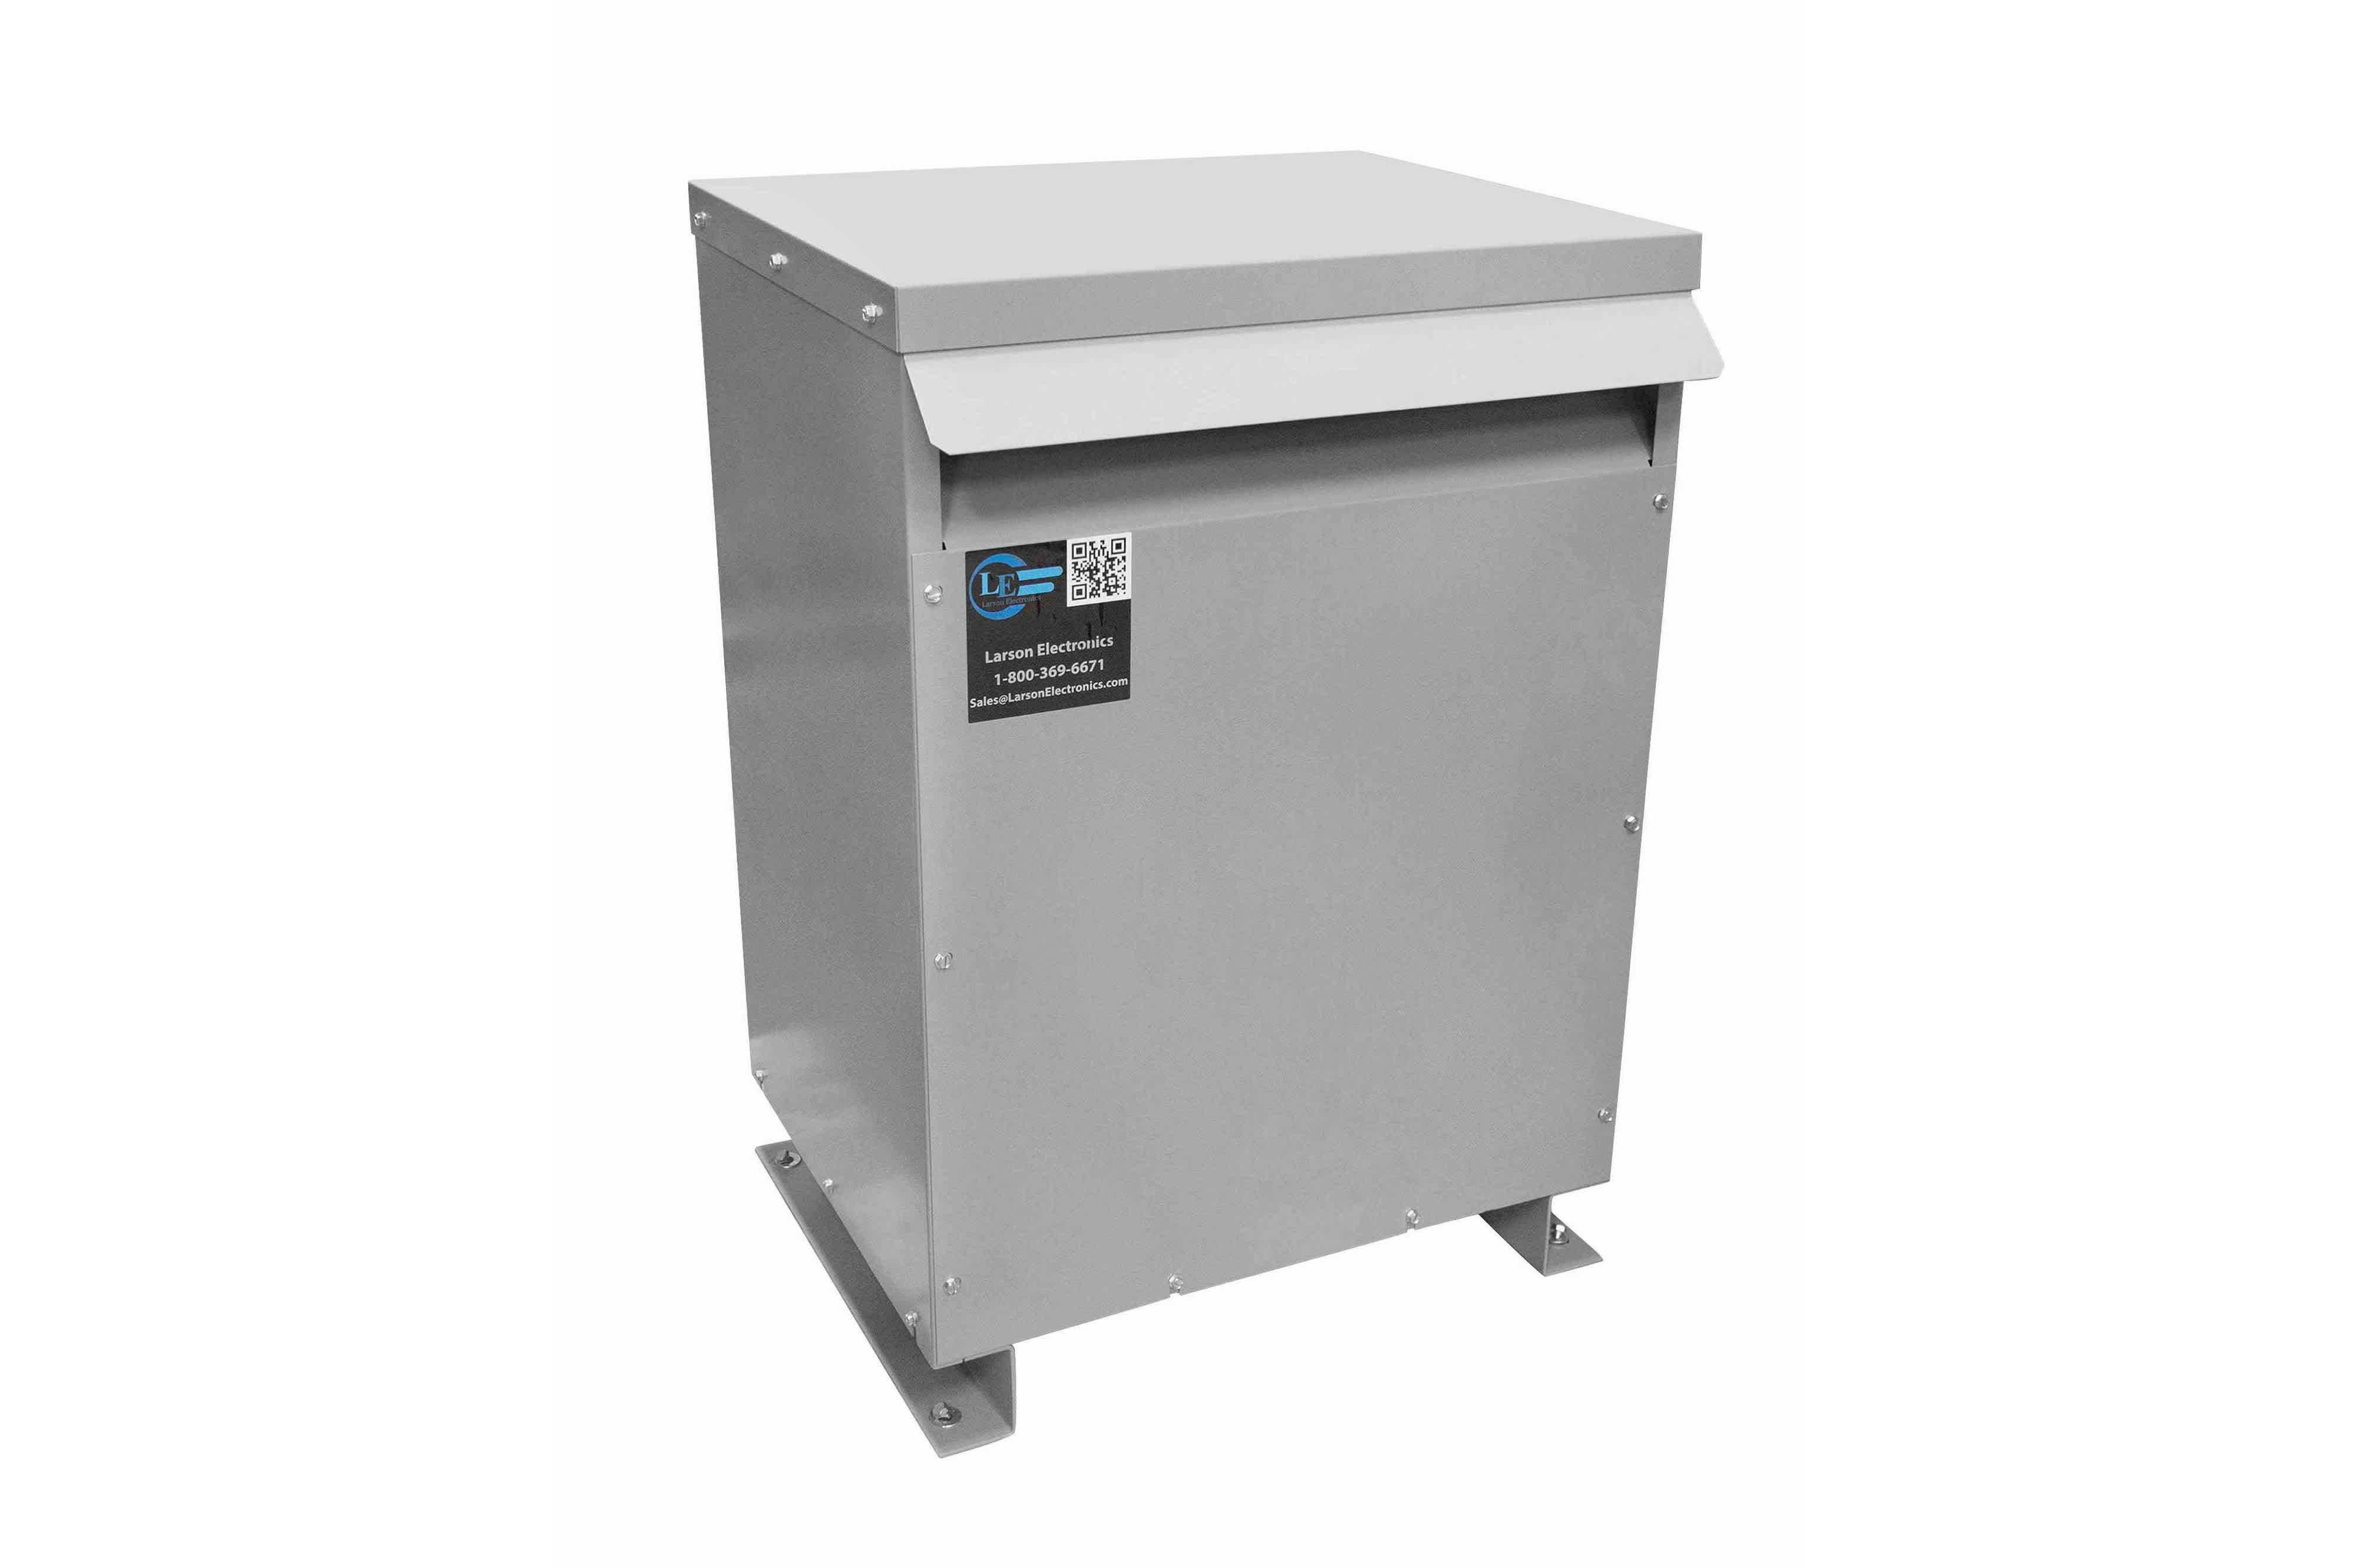 110 kVA 3PH Isolation Transformer, 575V Wye Primary, 400V Delta Secondary, N3R, Ventilated, 60 Hz